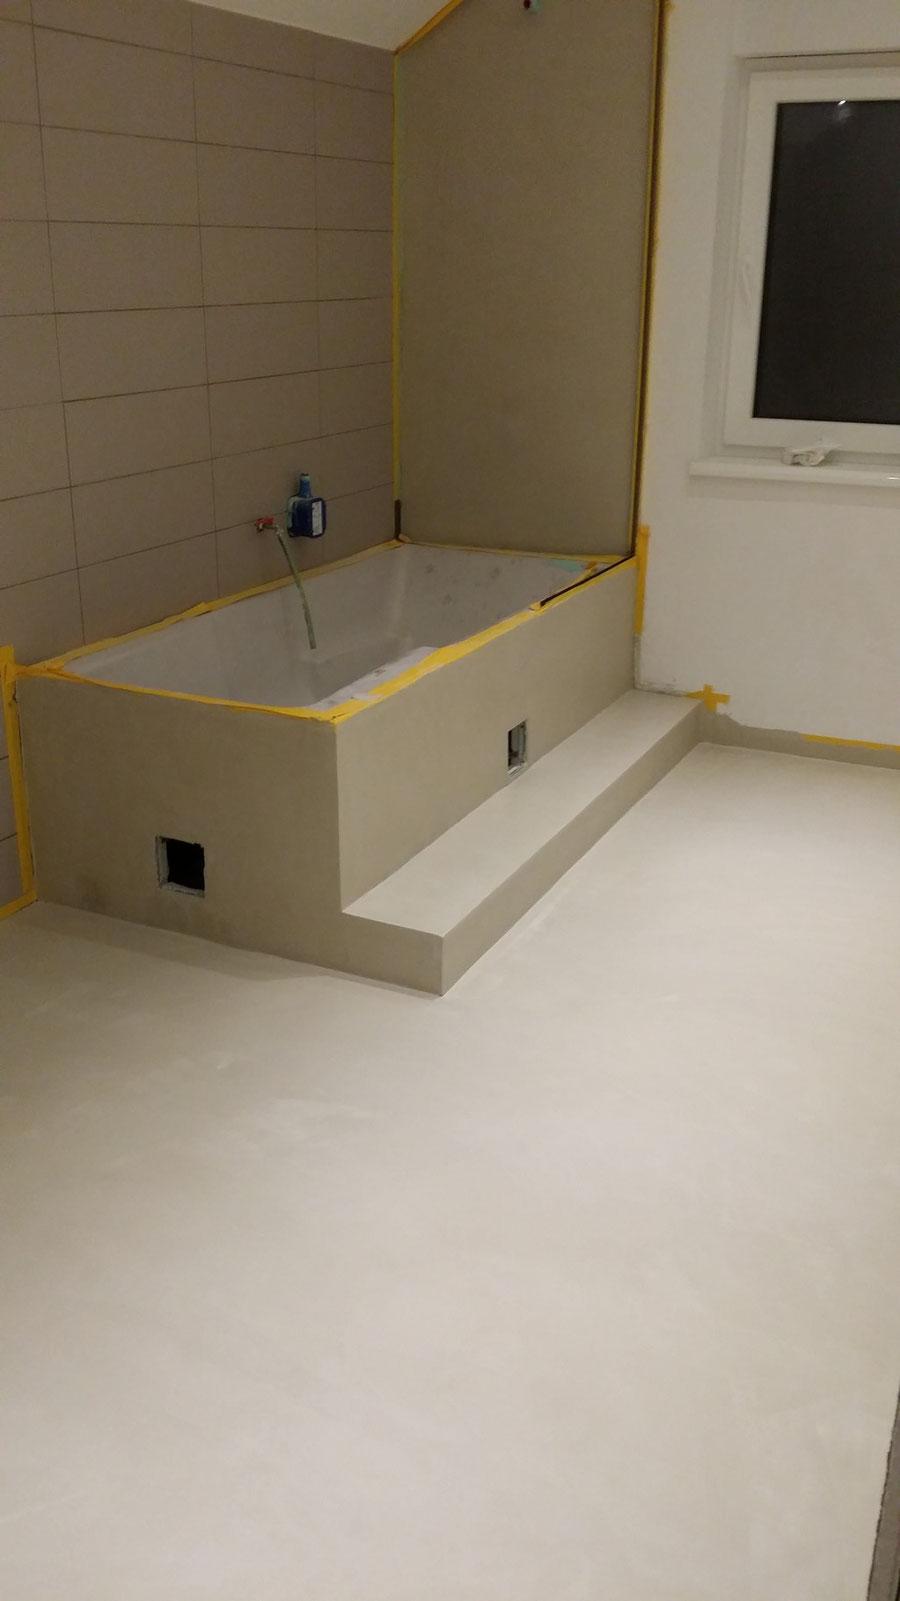 Bett selber bauen podest for Badezimmer bauen